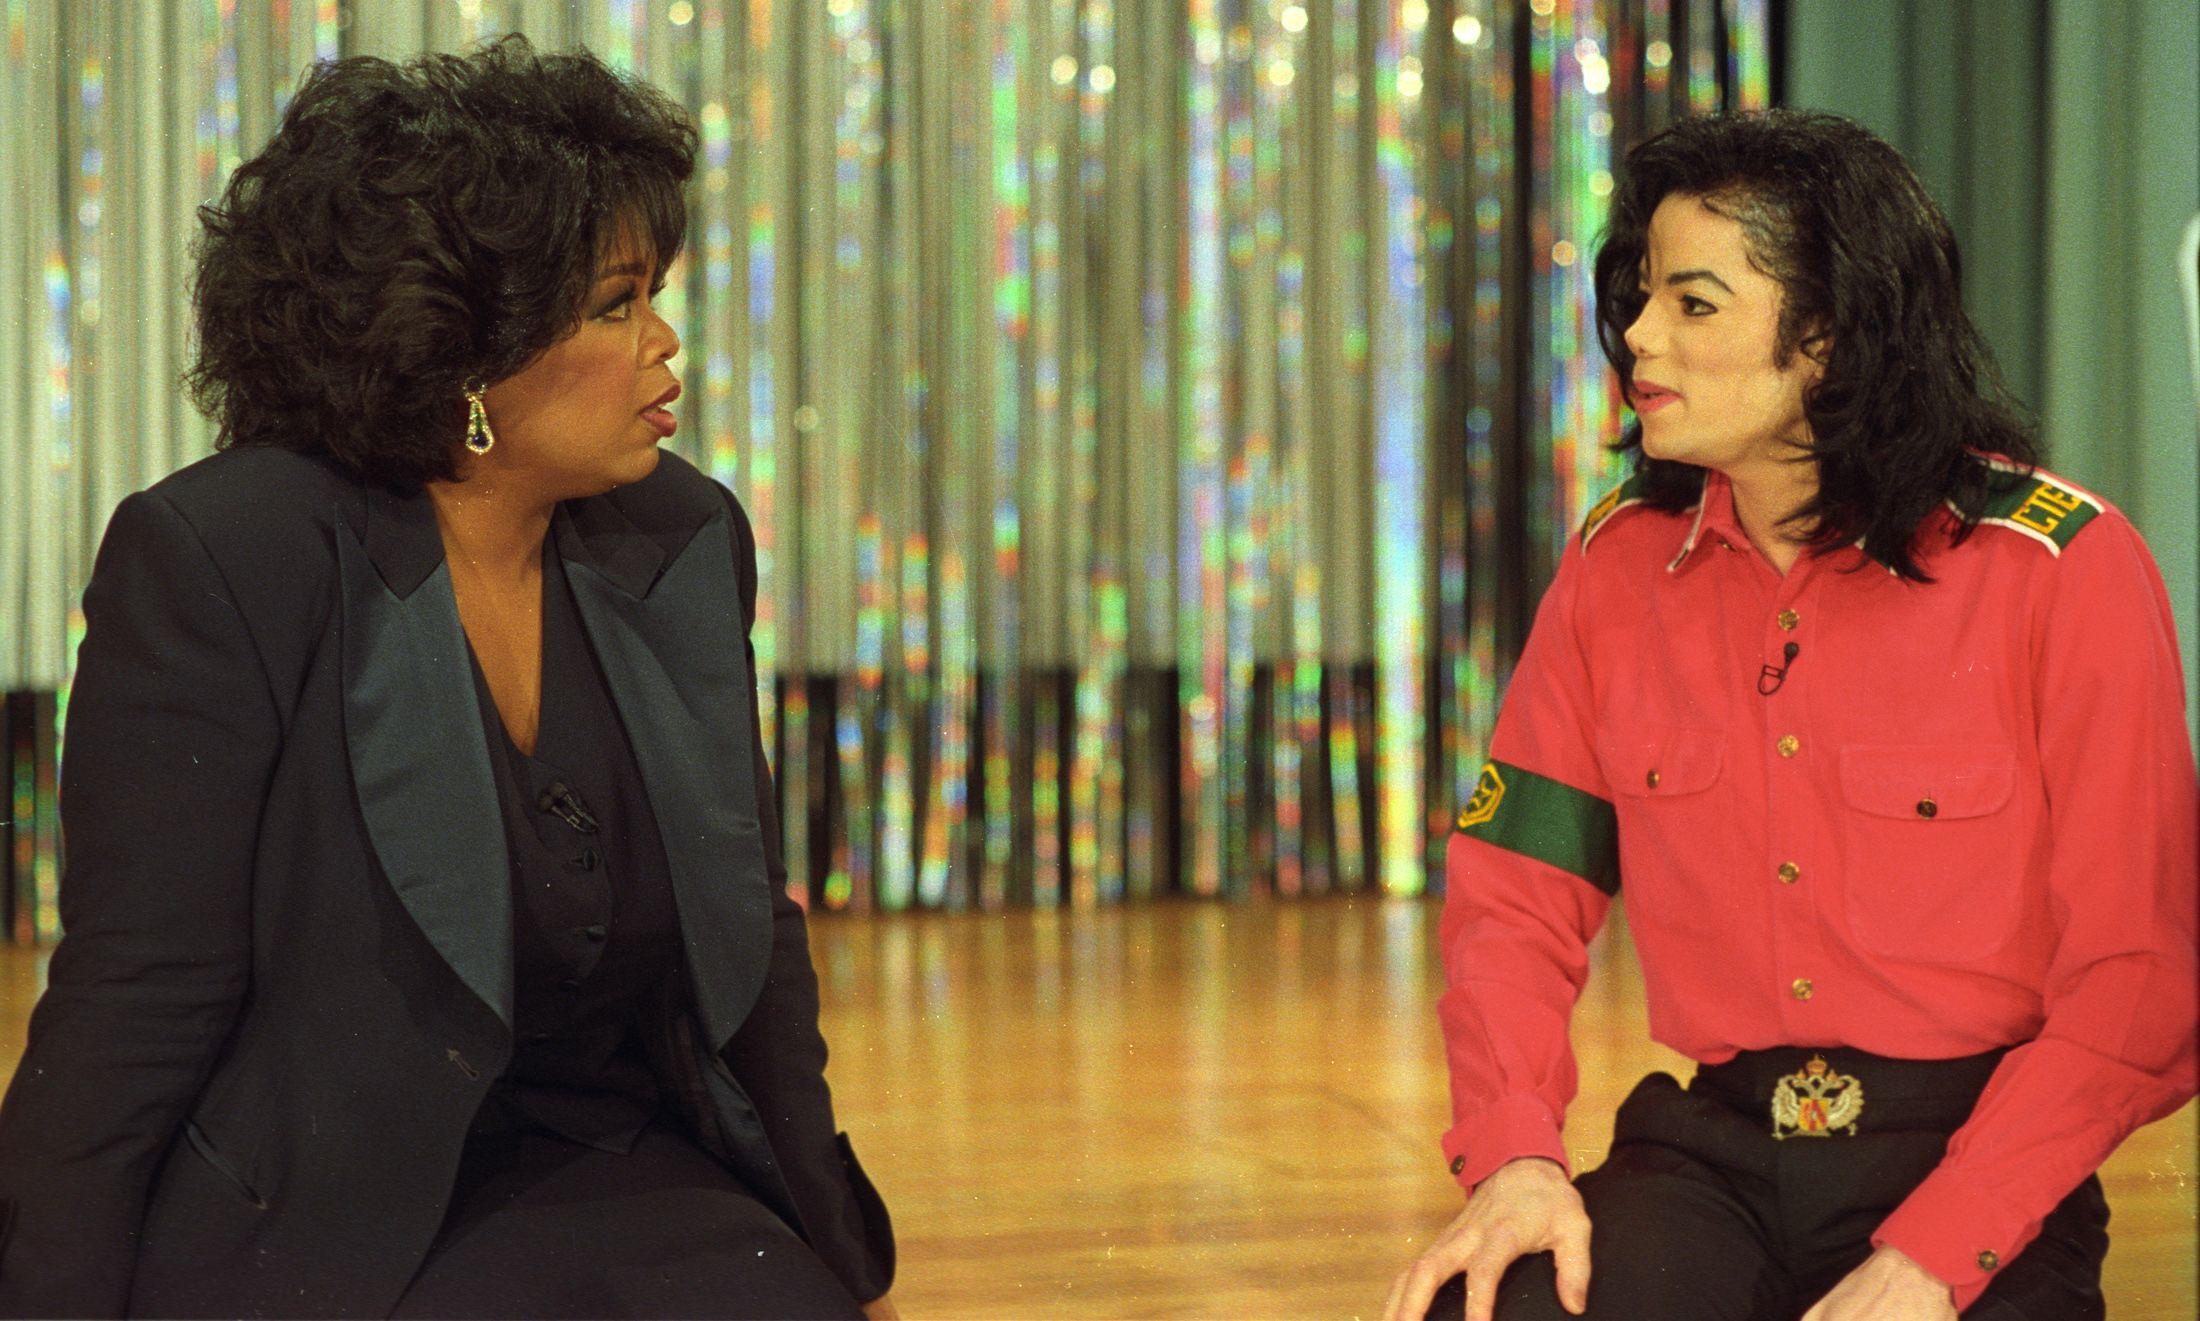 Michael Jackson interview with Oprah